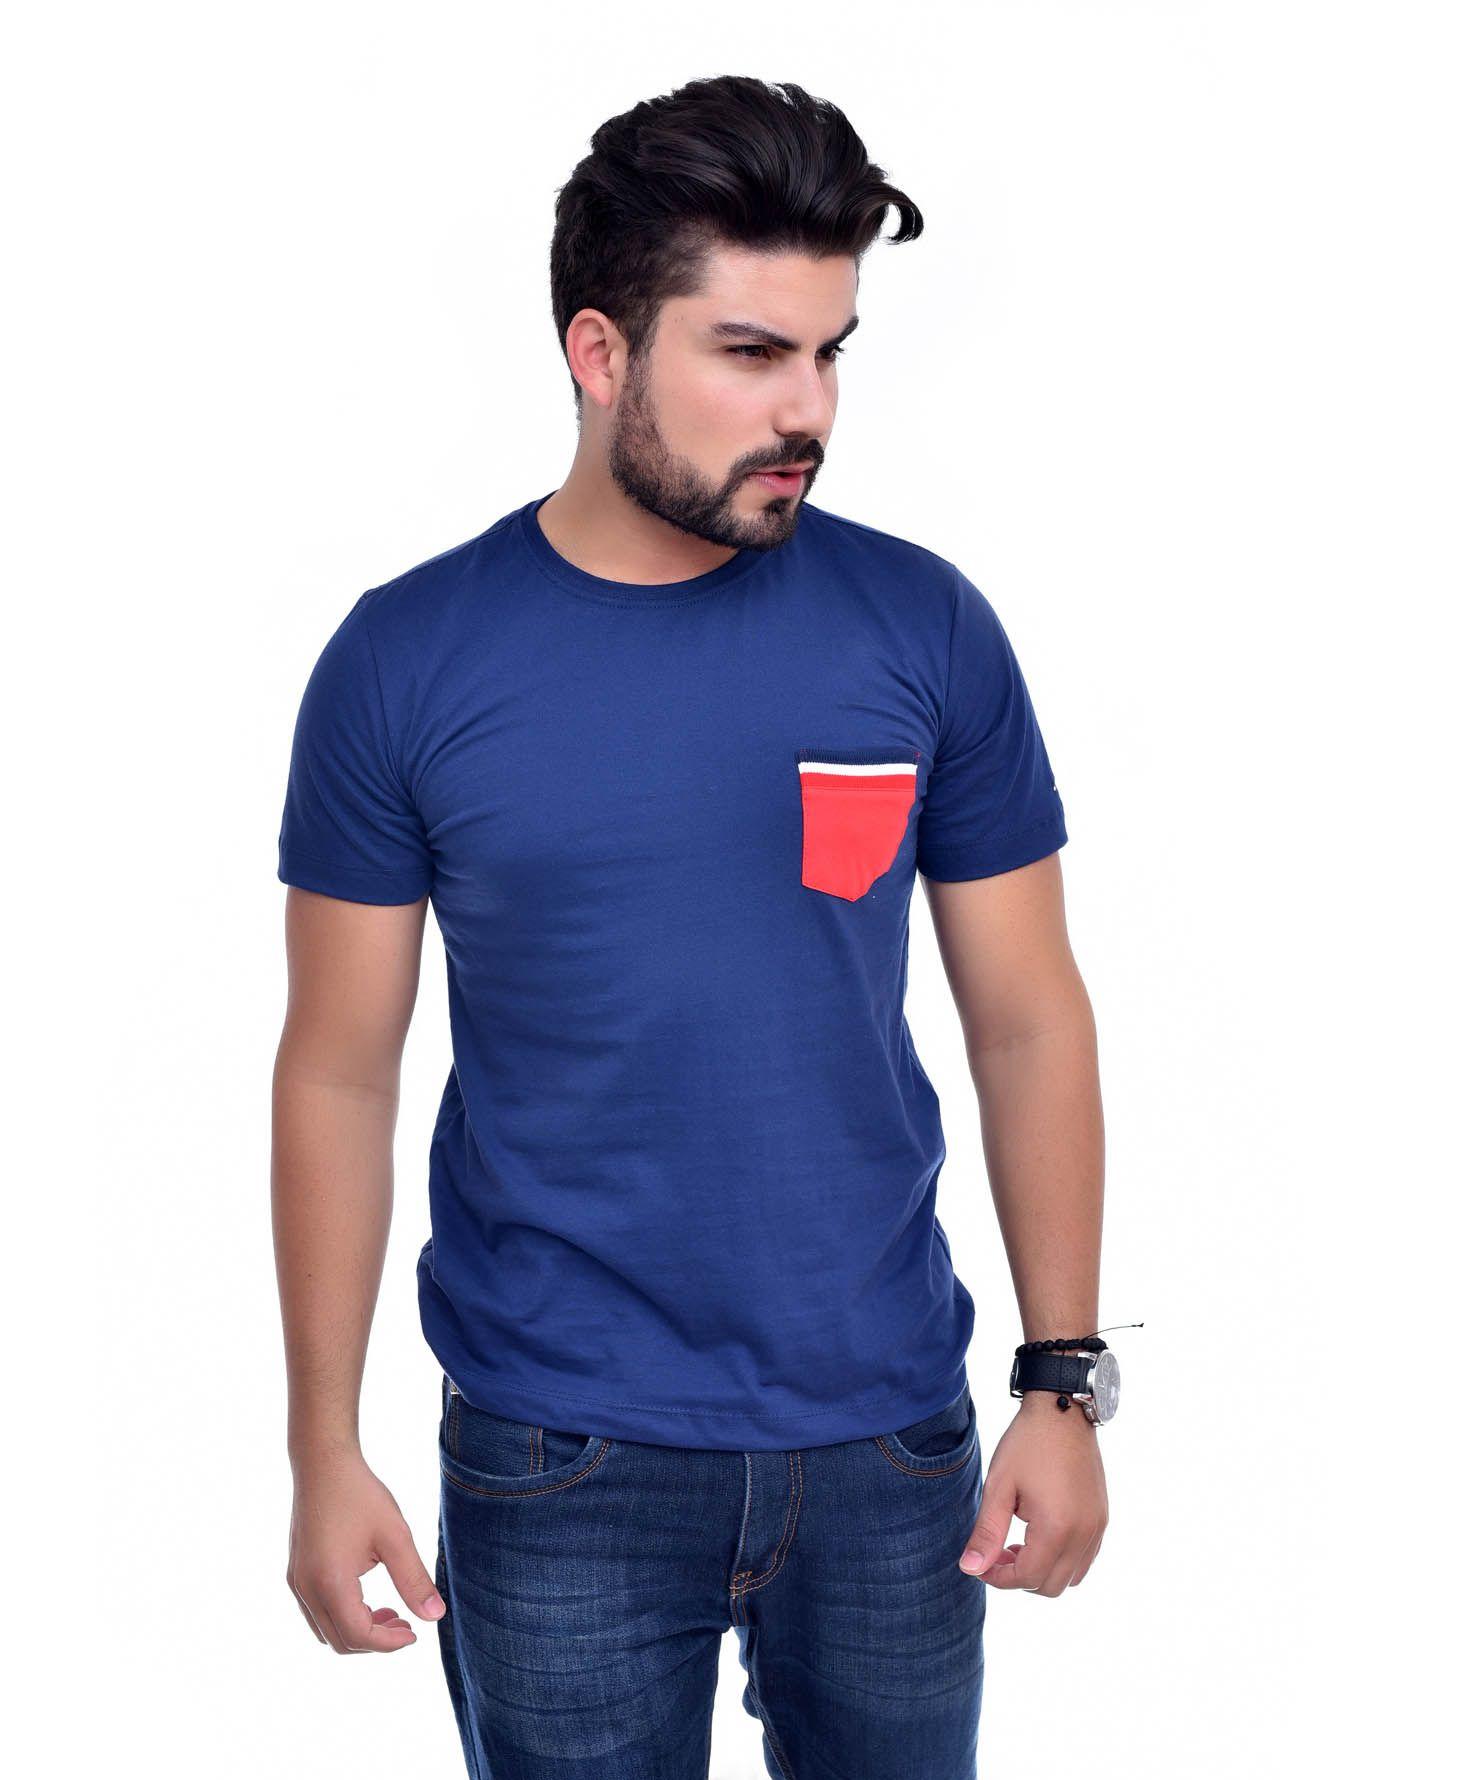 Camiseta Bolso TH Marinho / VR  - Ca Brasileira